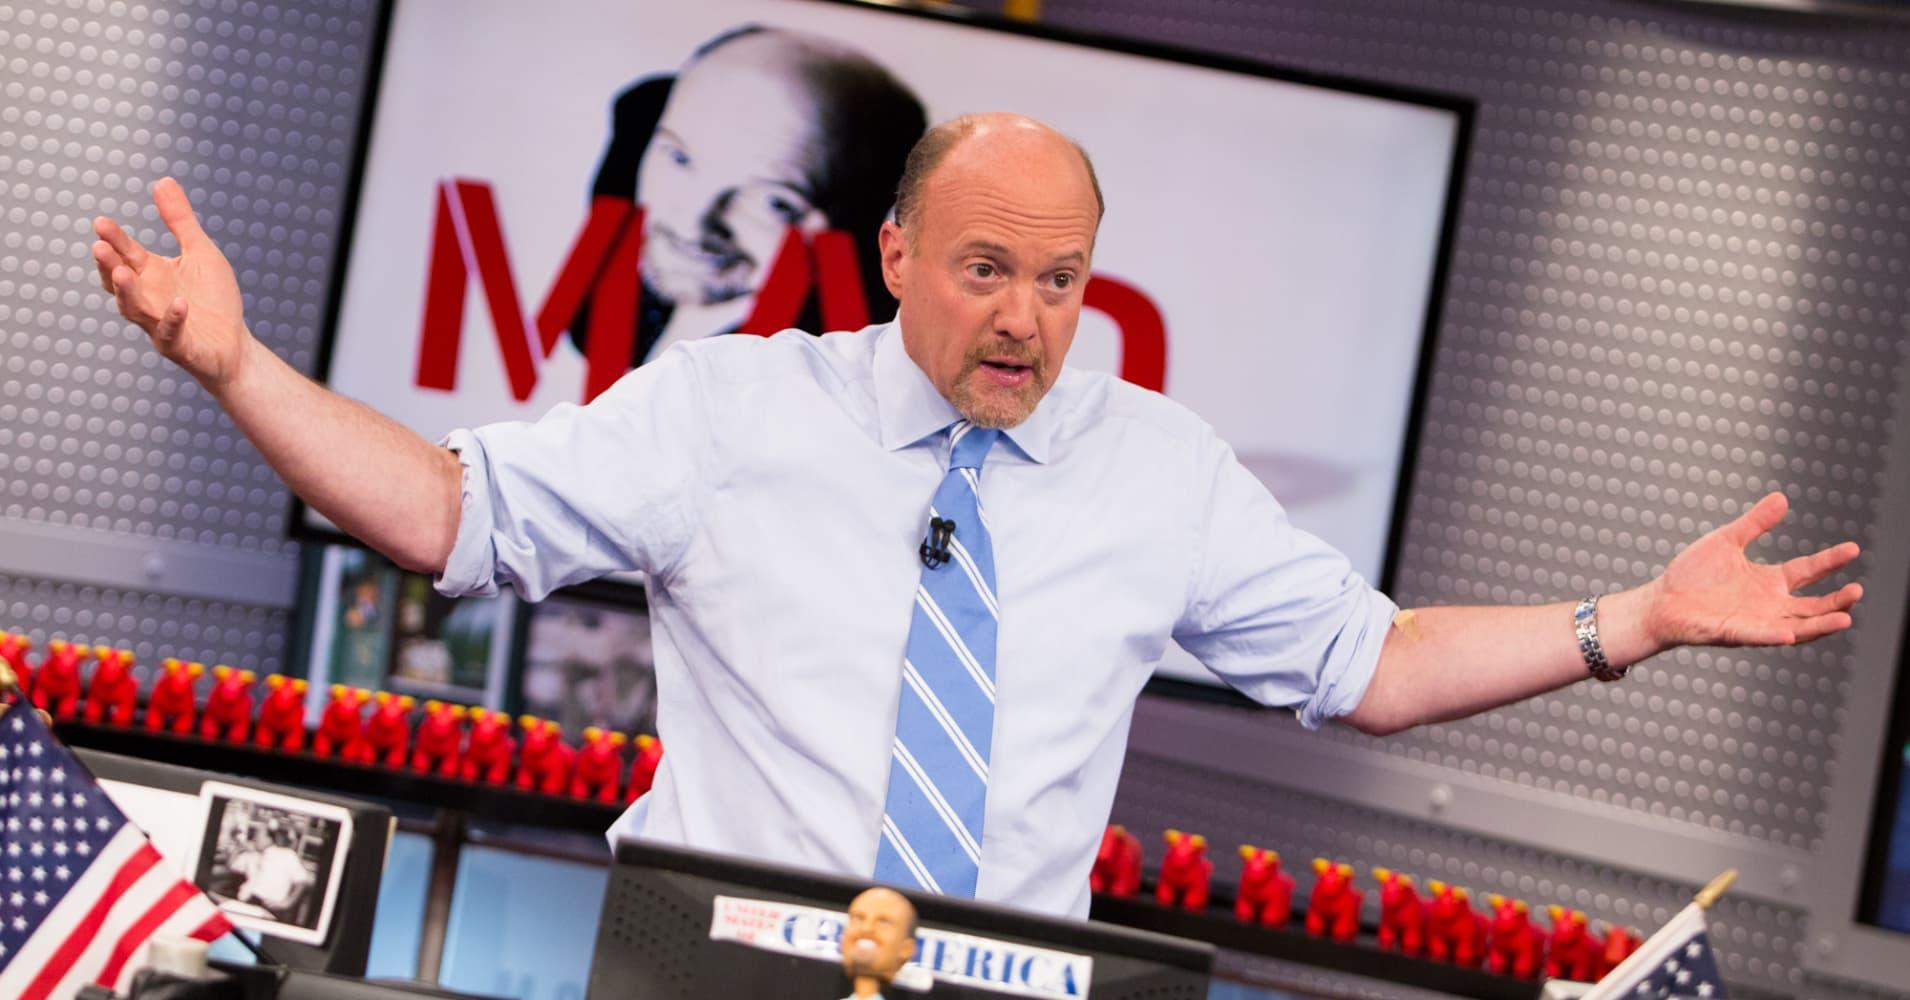 Cramer Remix: Investors have my blessing to get a taste of Smucker